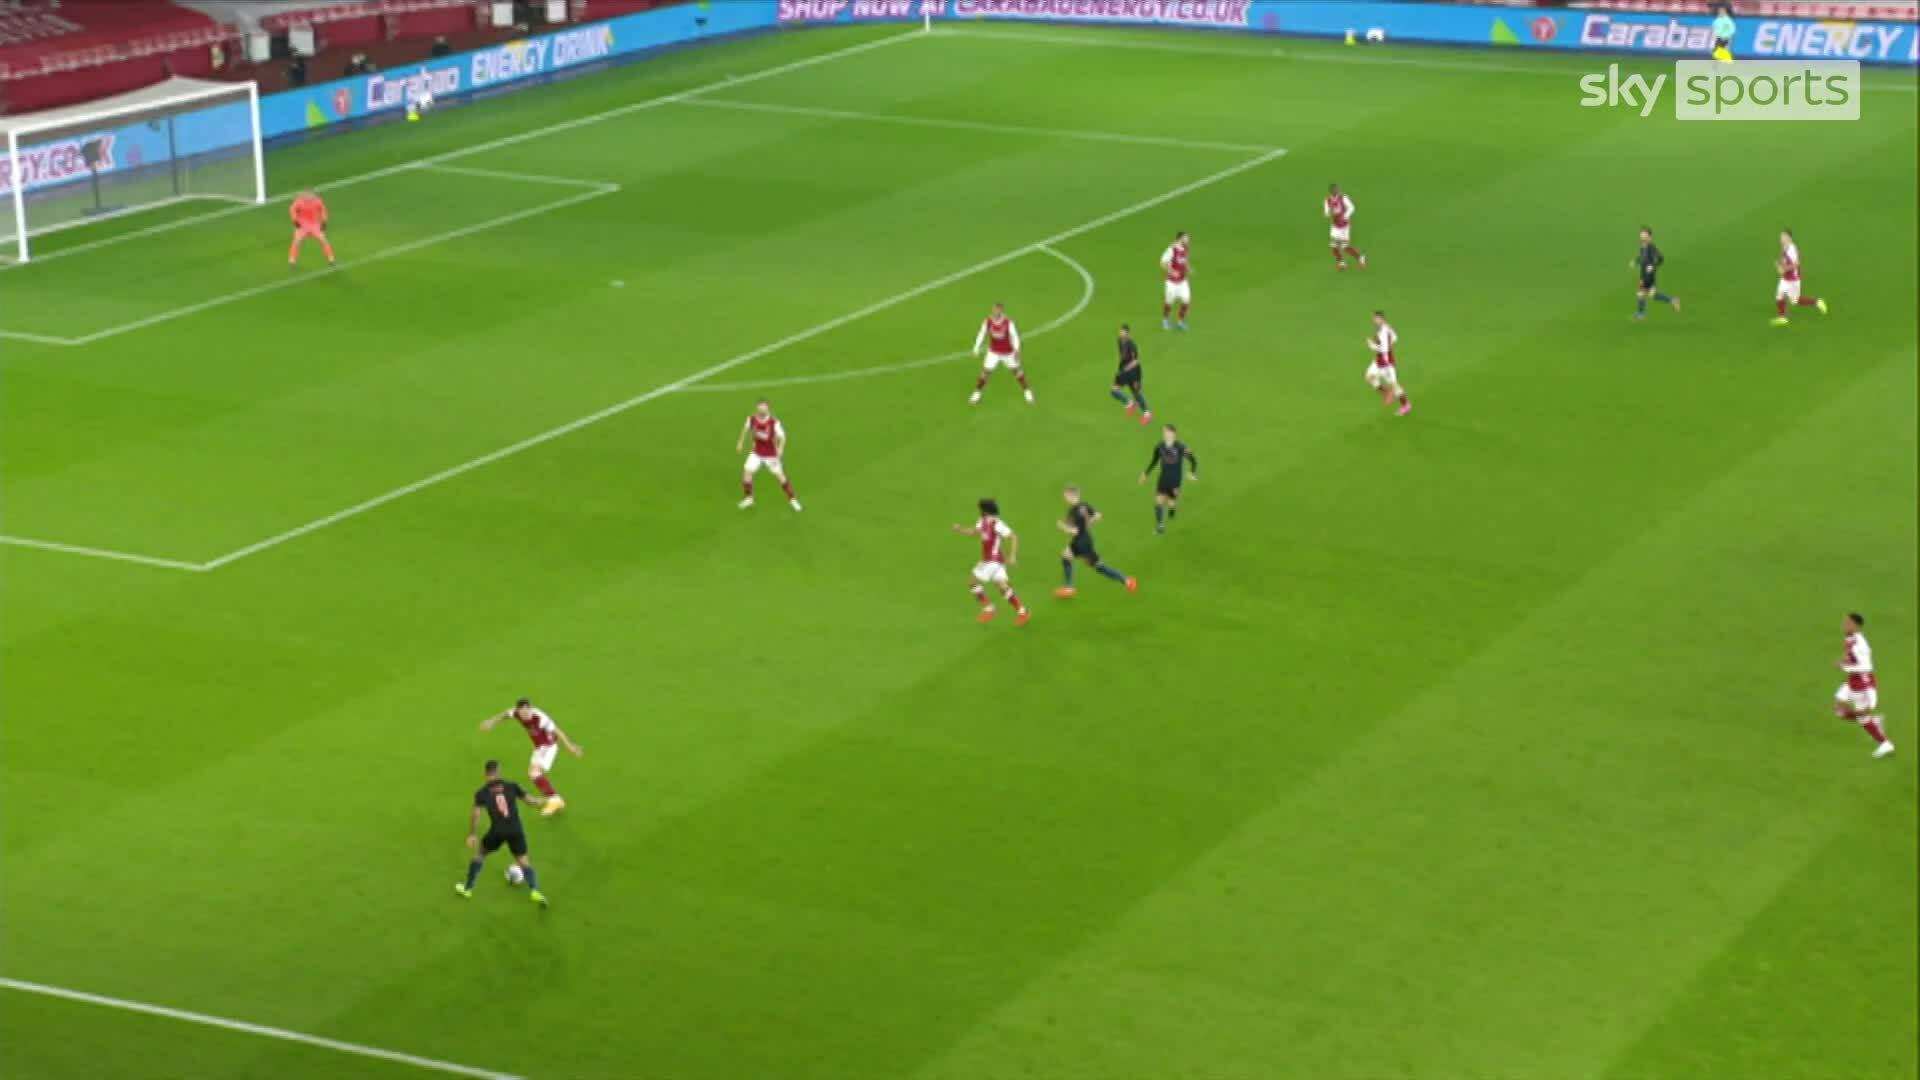 Arsenal 1-4 Man City